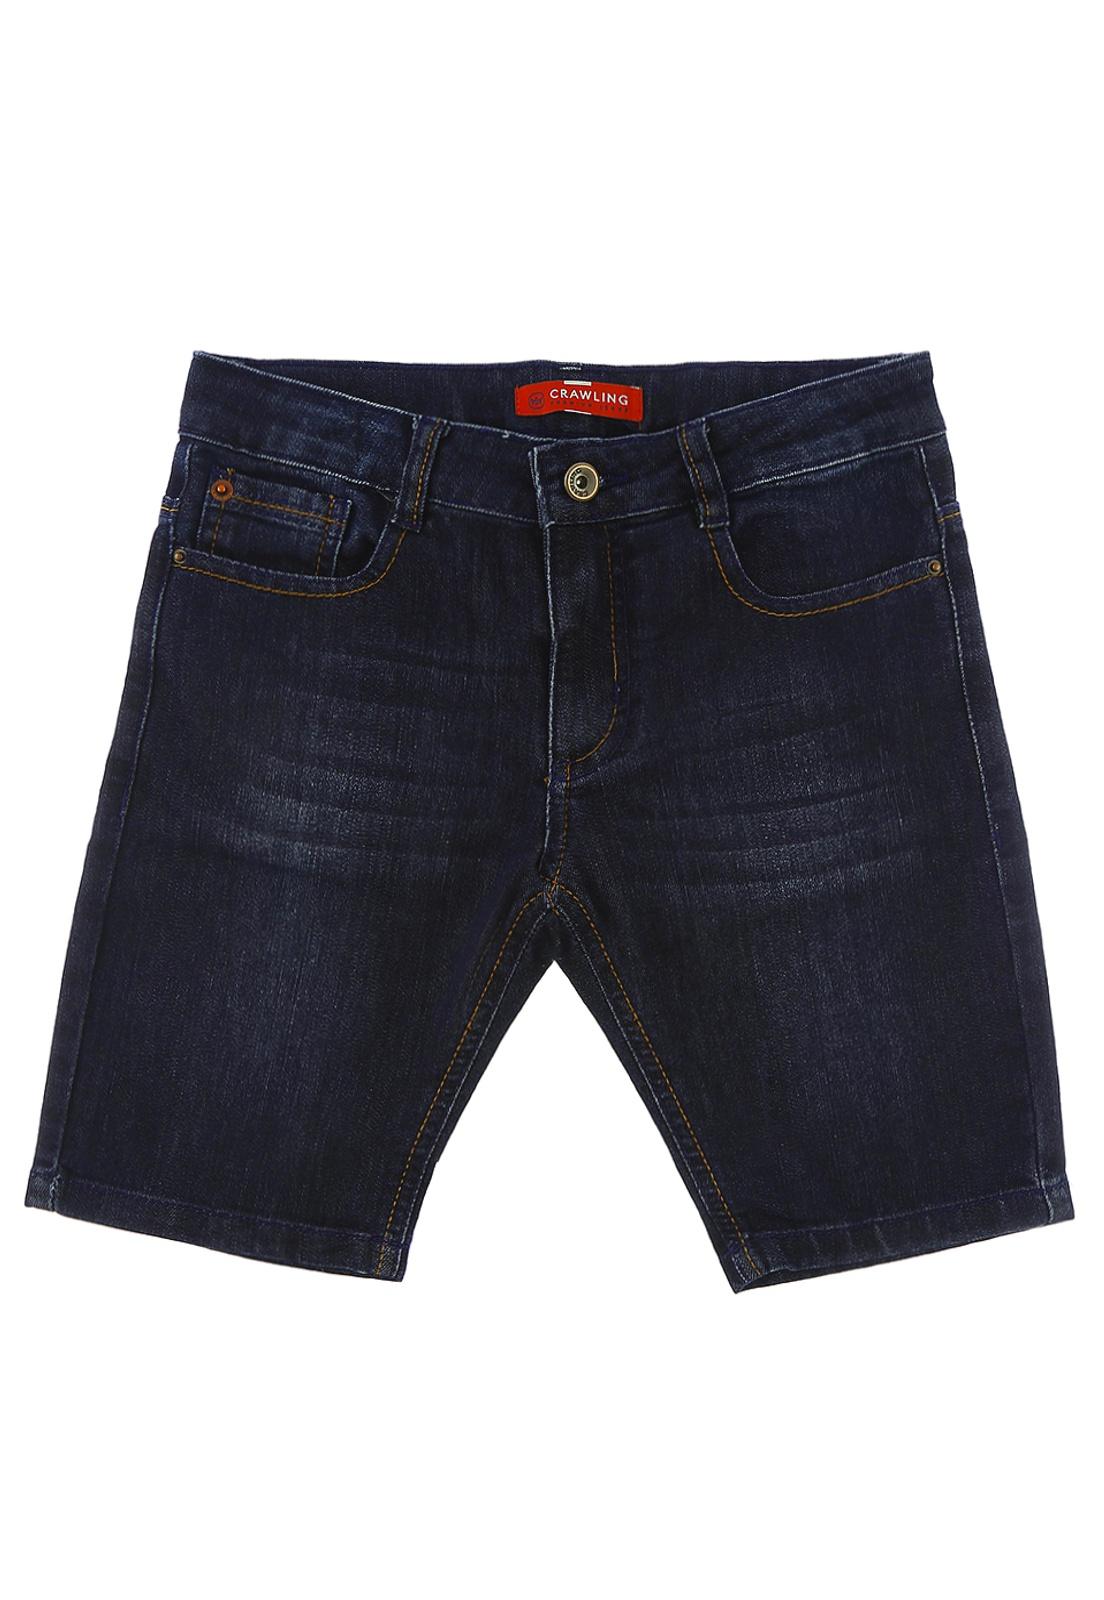 Bermuda Infantil Masculina Crawling Jeans